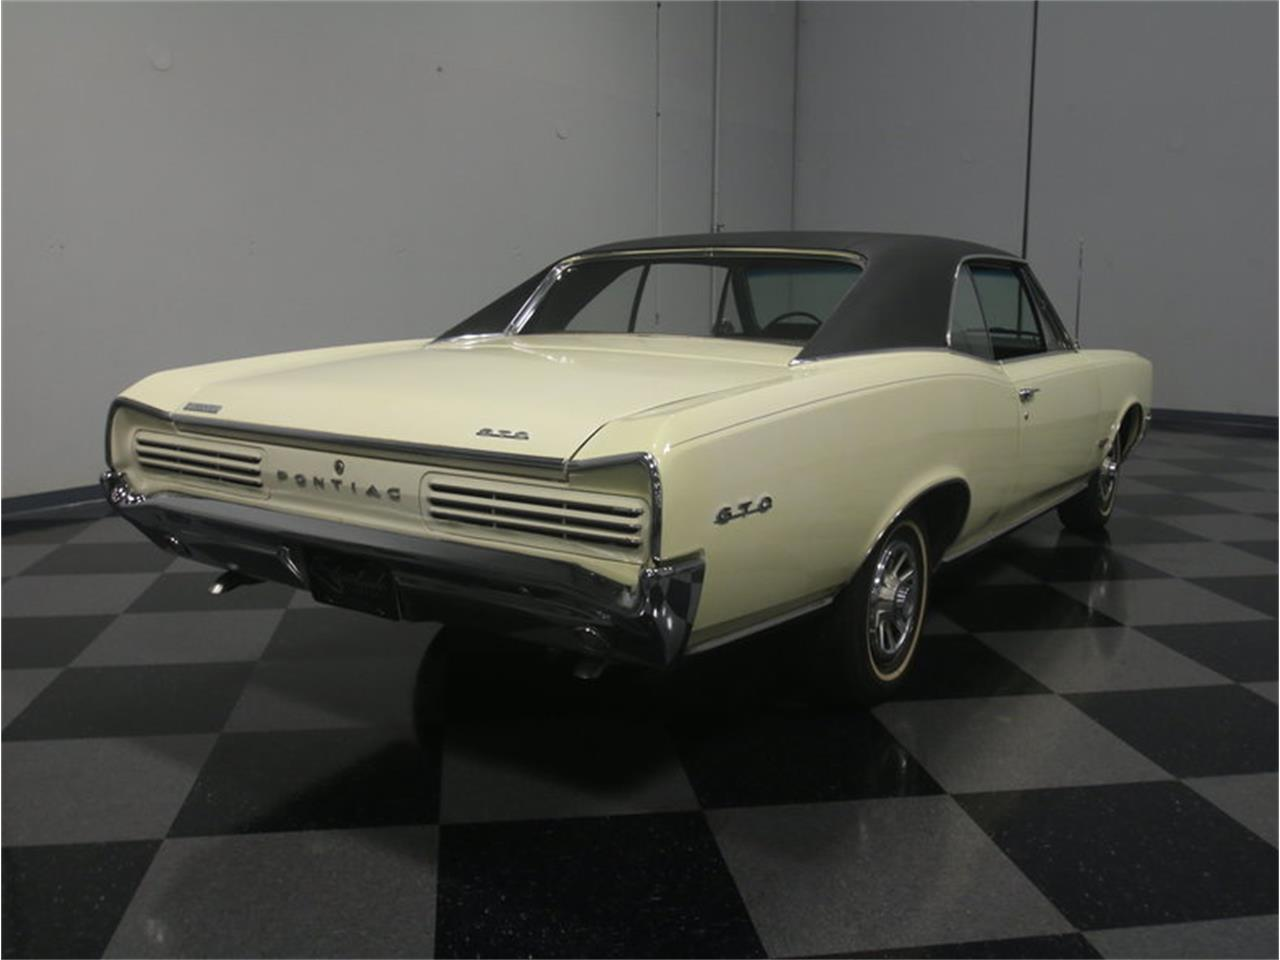 Large Picture of 1966 Pontiac GTO located in Georgia - $29,995.00 - L6I4